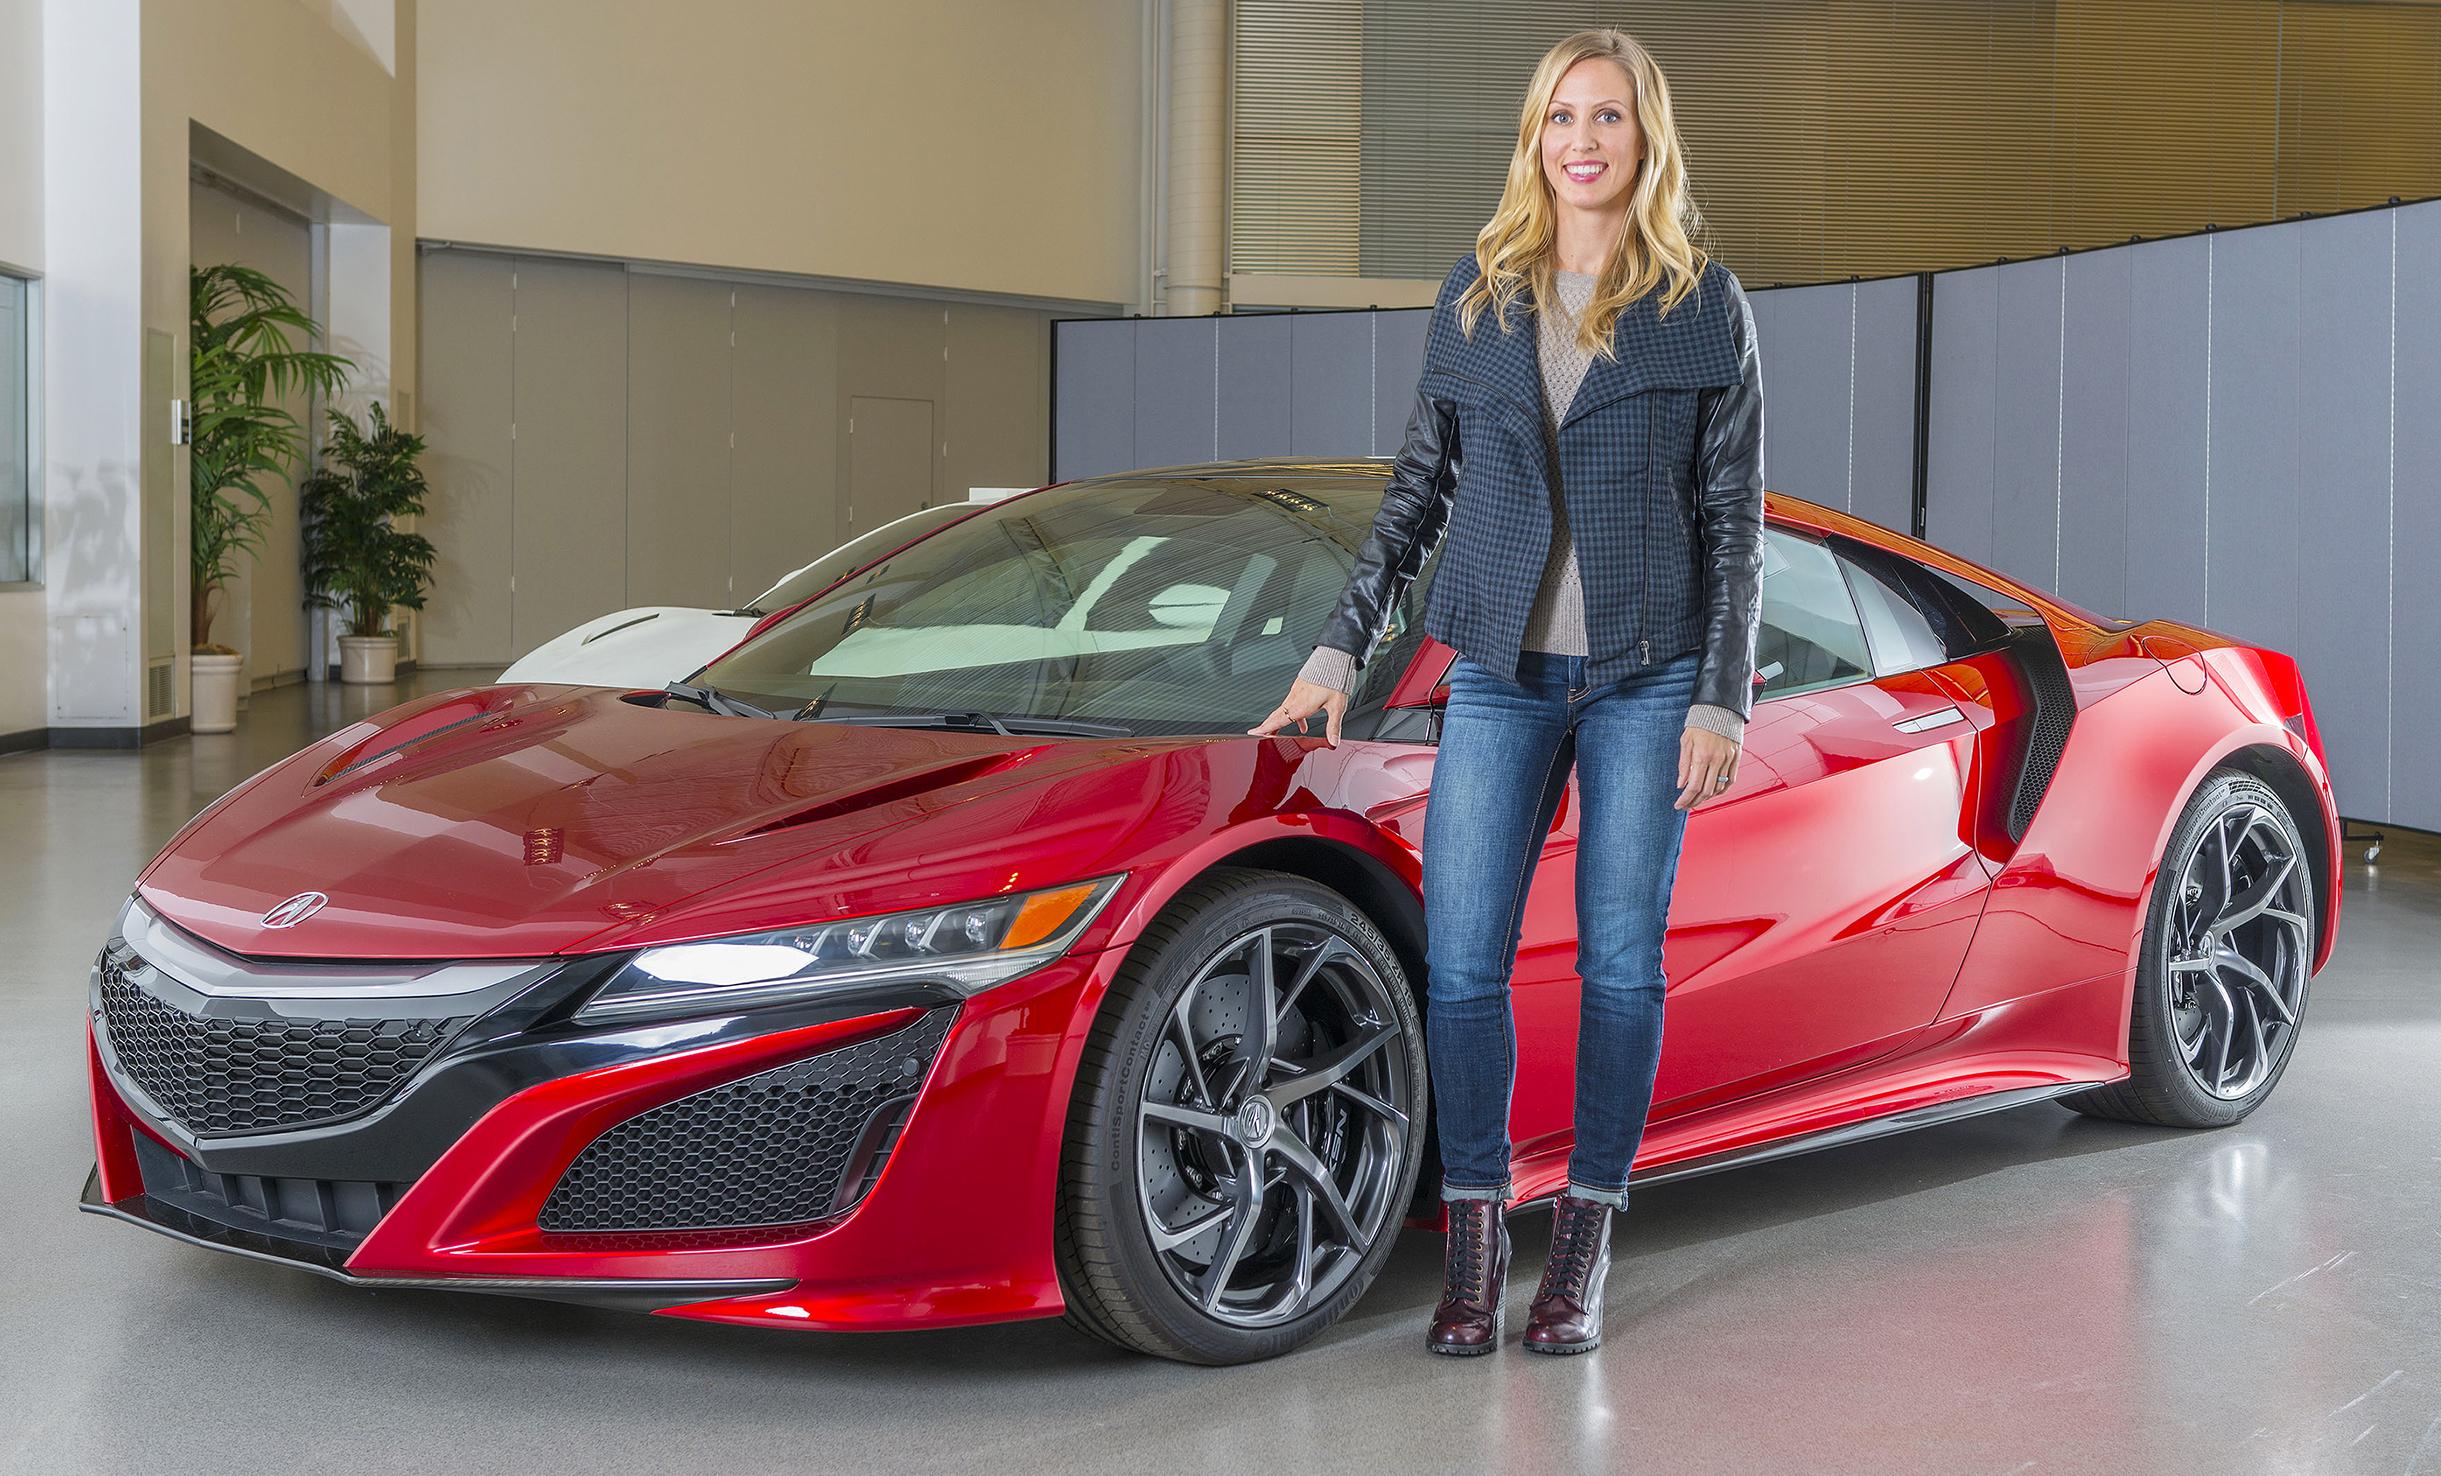 Transportation Design alumna Michelle Christensen with Acura